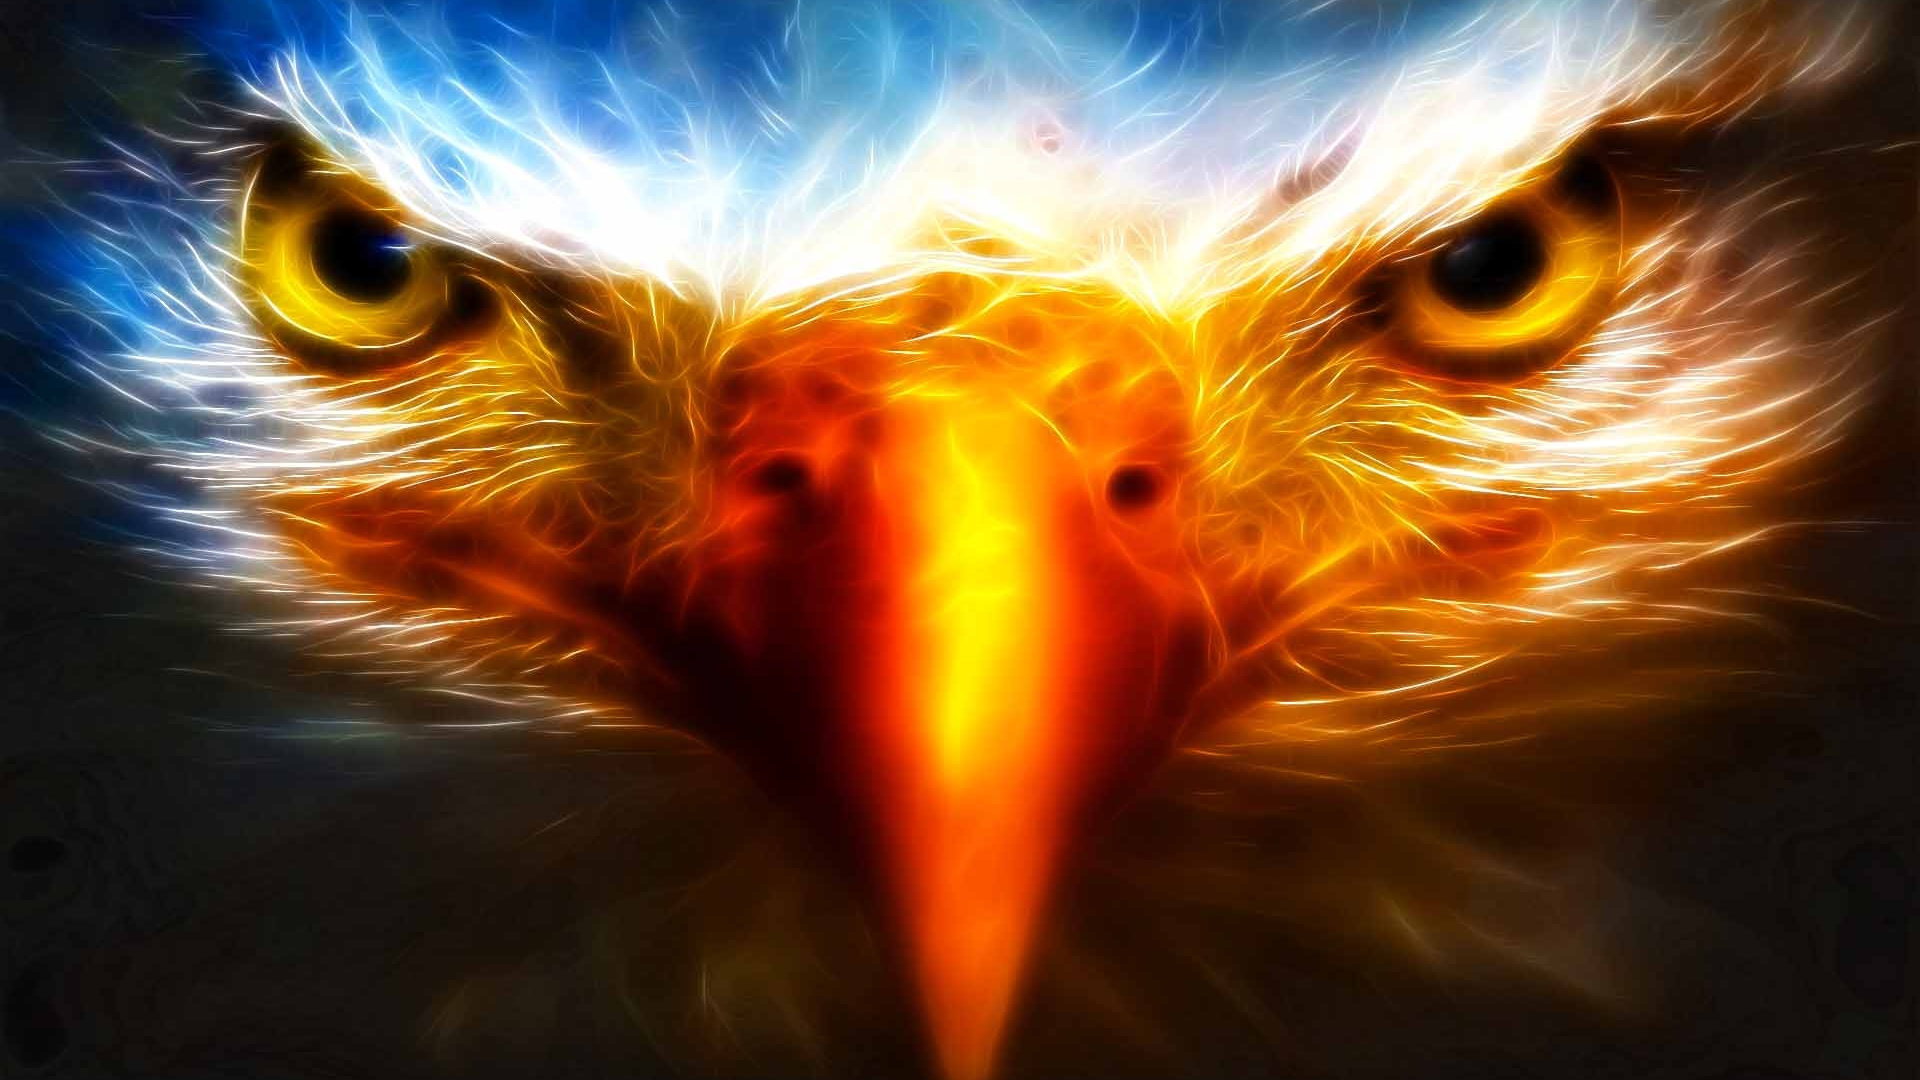 eagle 3d cool hd wallpapers desktop background 1920x1080